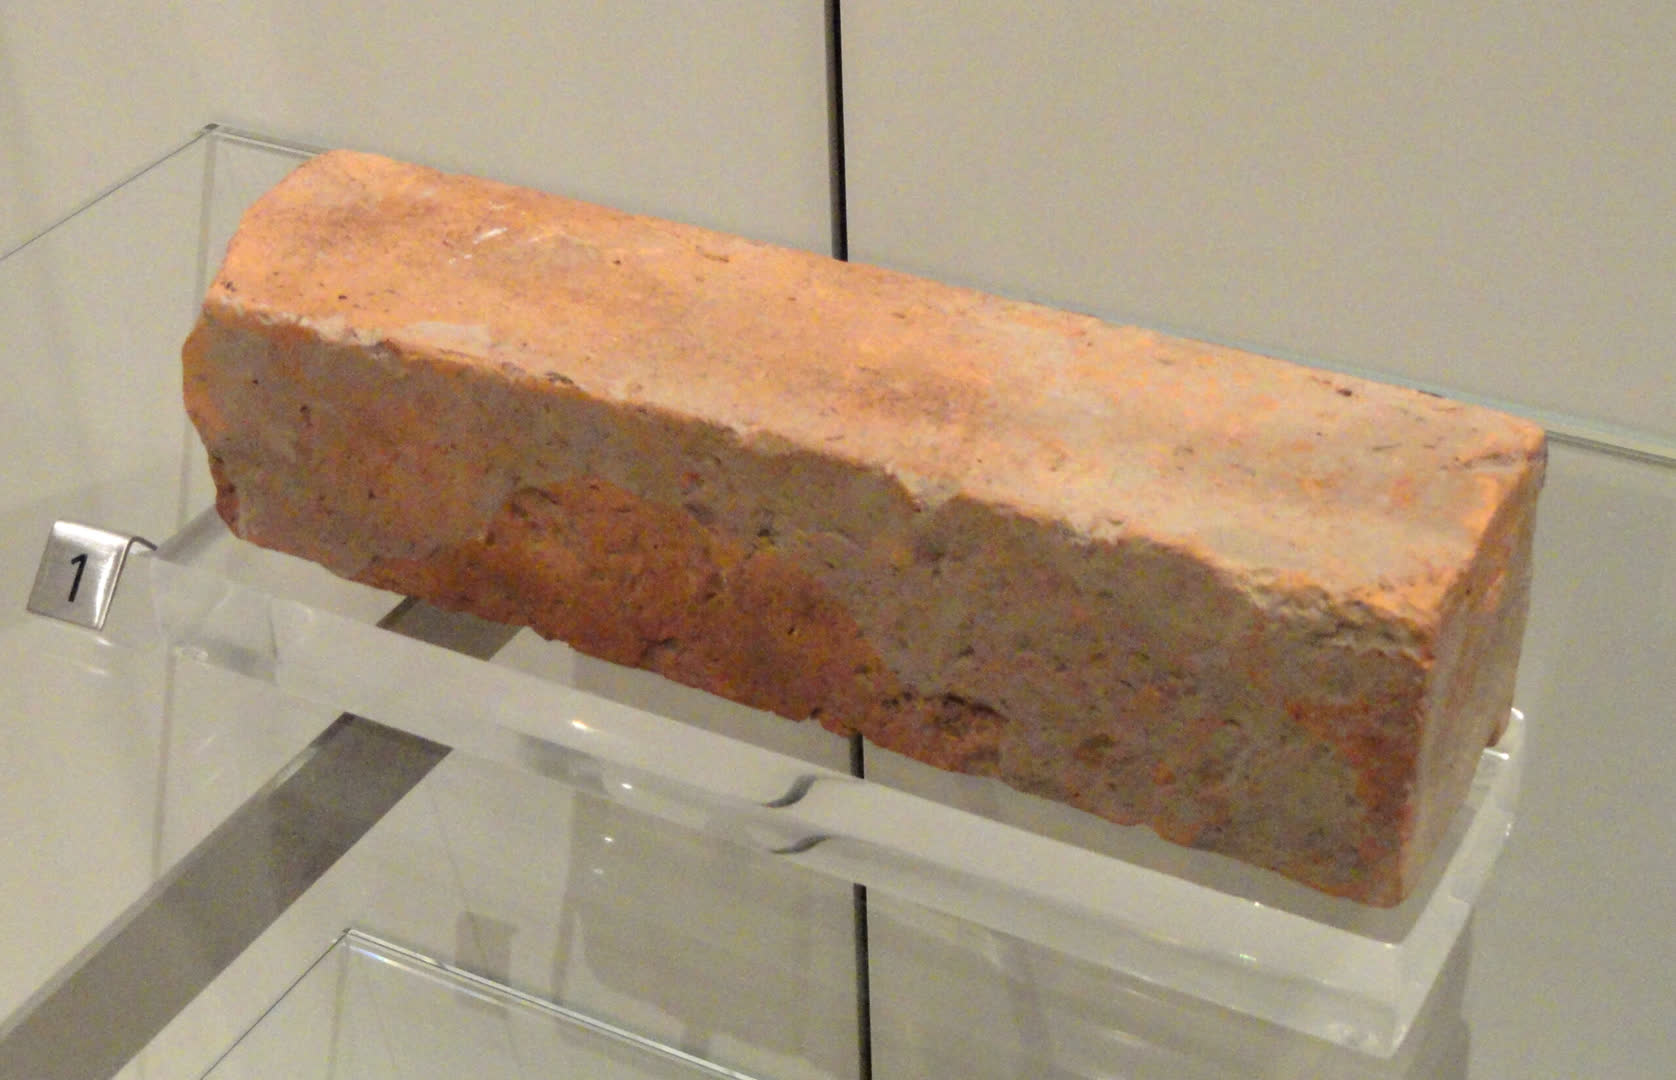 Harappan Phase Cut brick c. 2500 – 1900 BCE, Chanhudaro